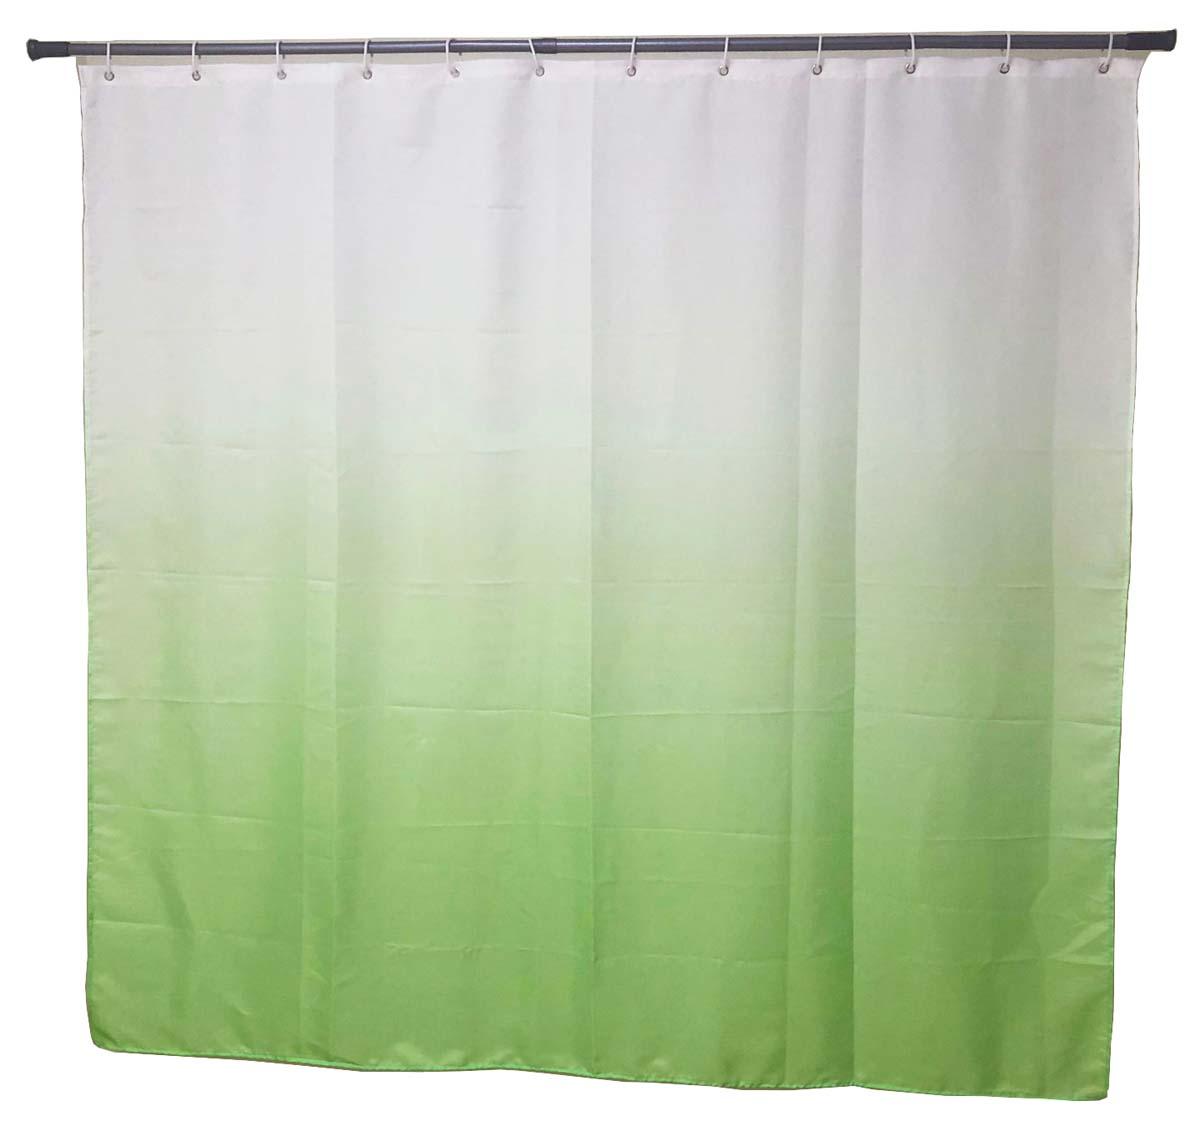 Штора для ванной Swensa Gradient, цвет: зеленый, 180 х 180 см штора для ванной swensa бамбук цвет зеленый 180 х 180 см